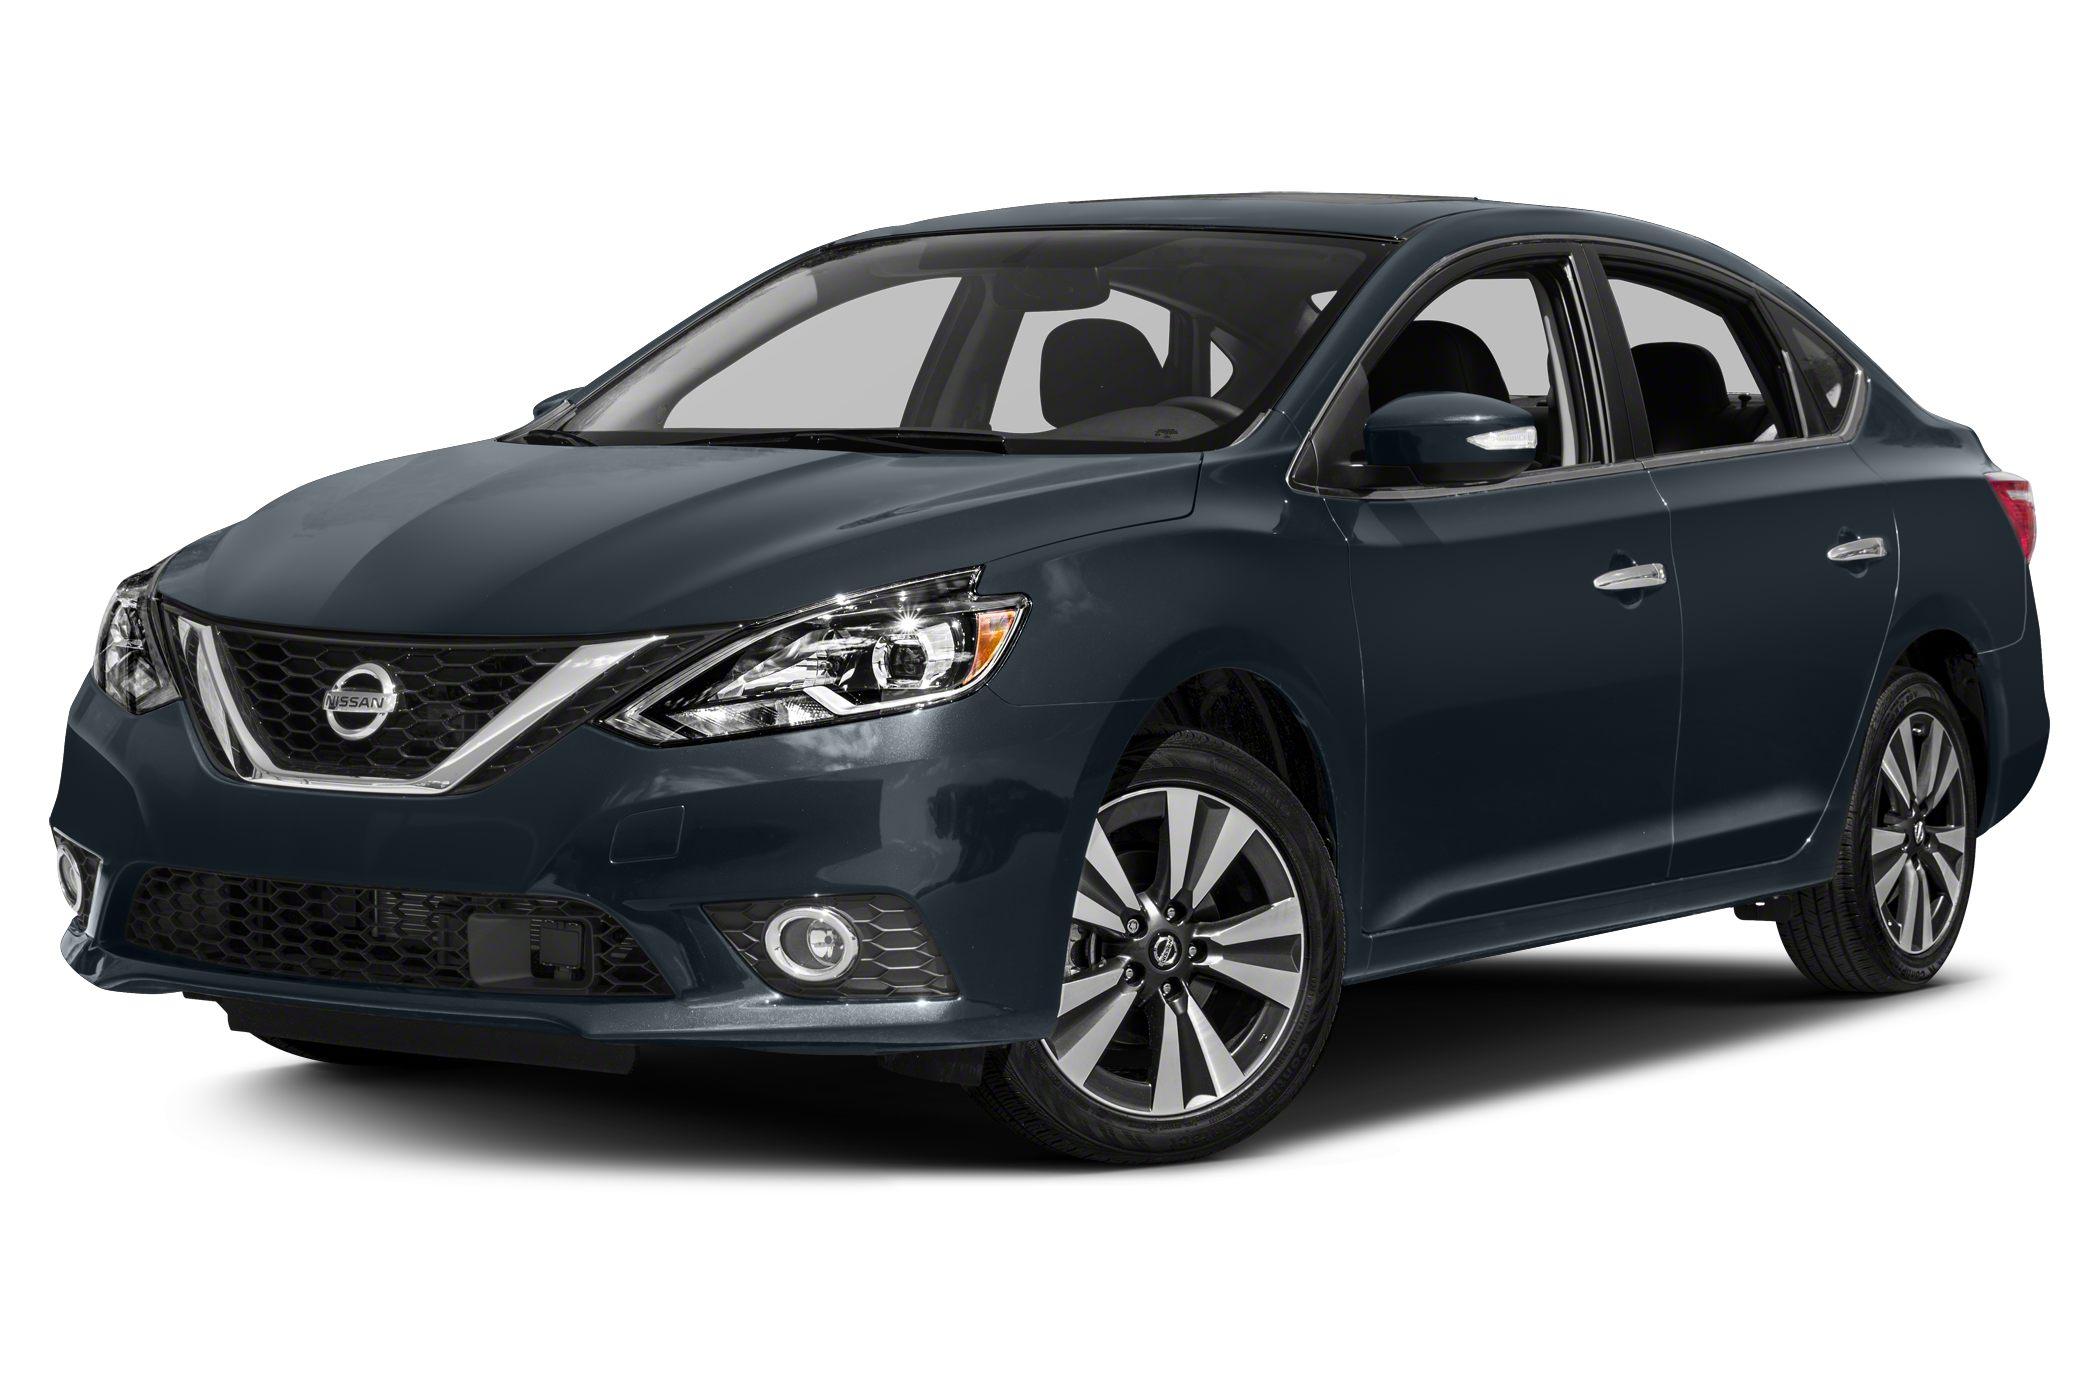 nissan sentra safety reviews 2017 2018 best cars reviews. Black Bedroom Furniture Sets. Home Design Ideas